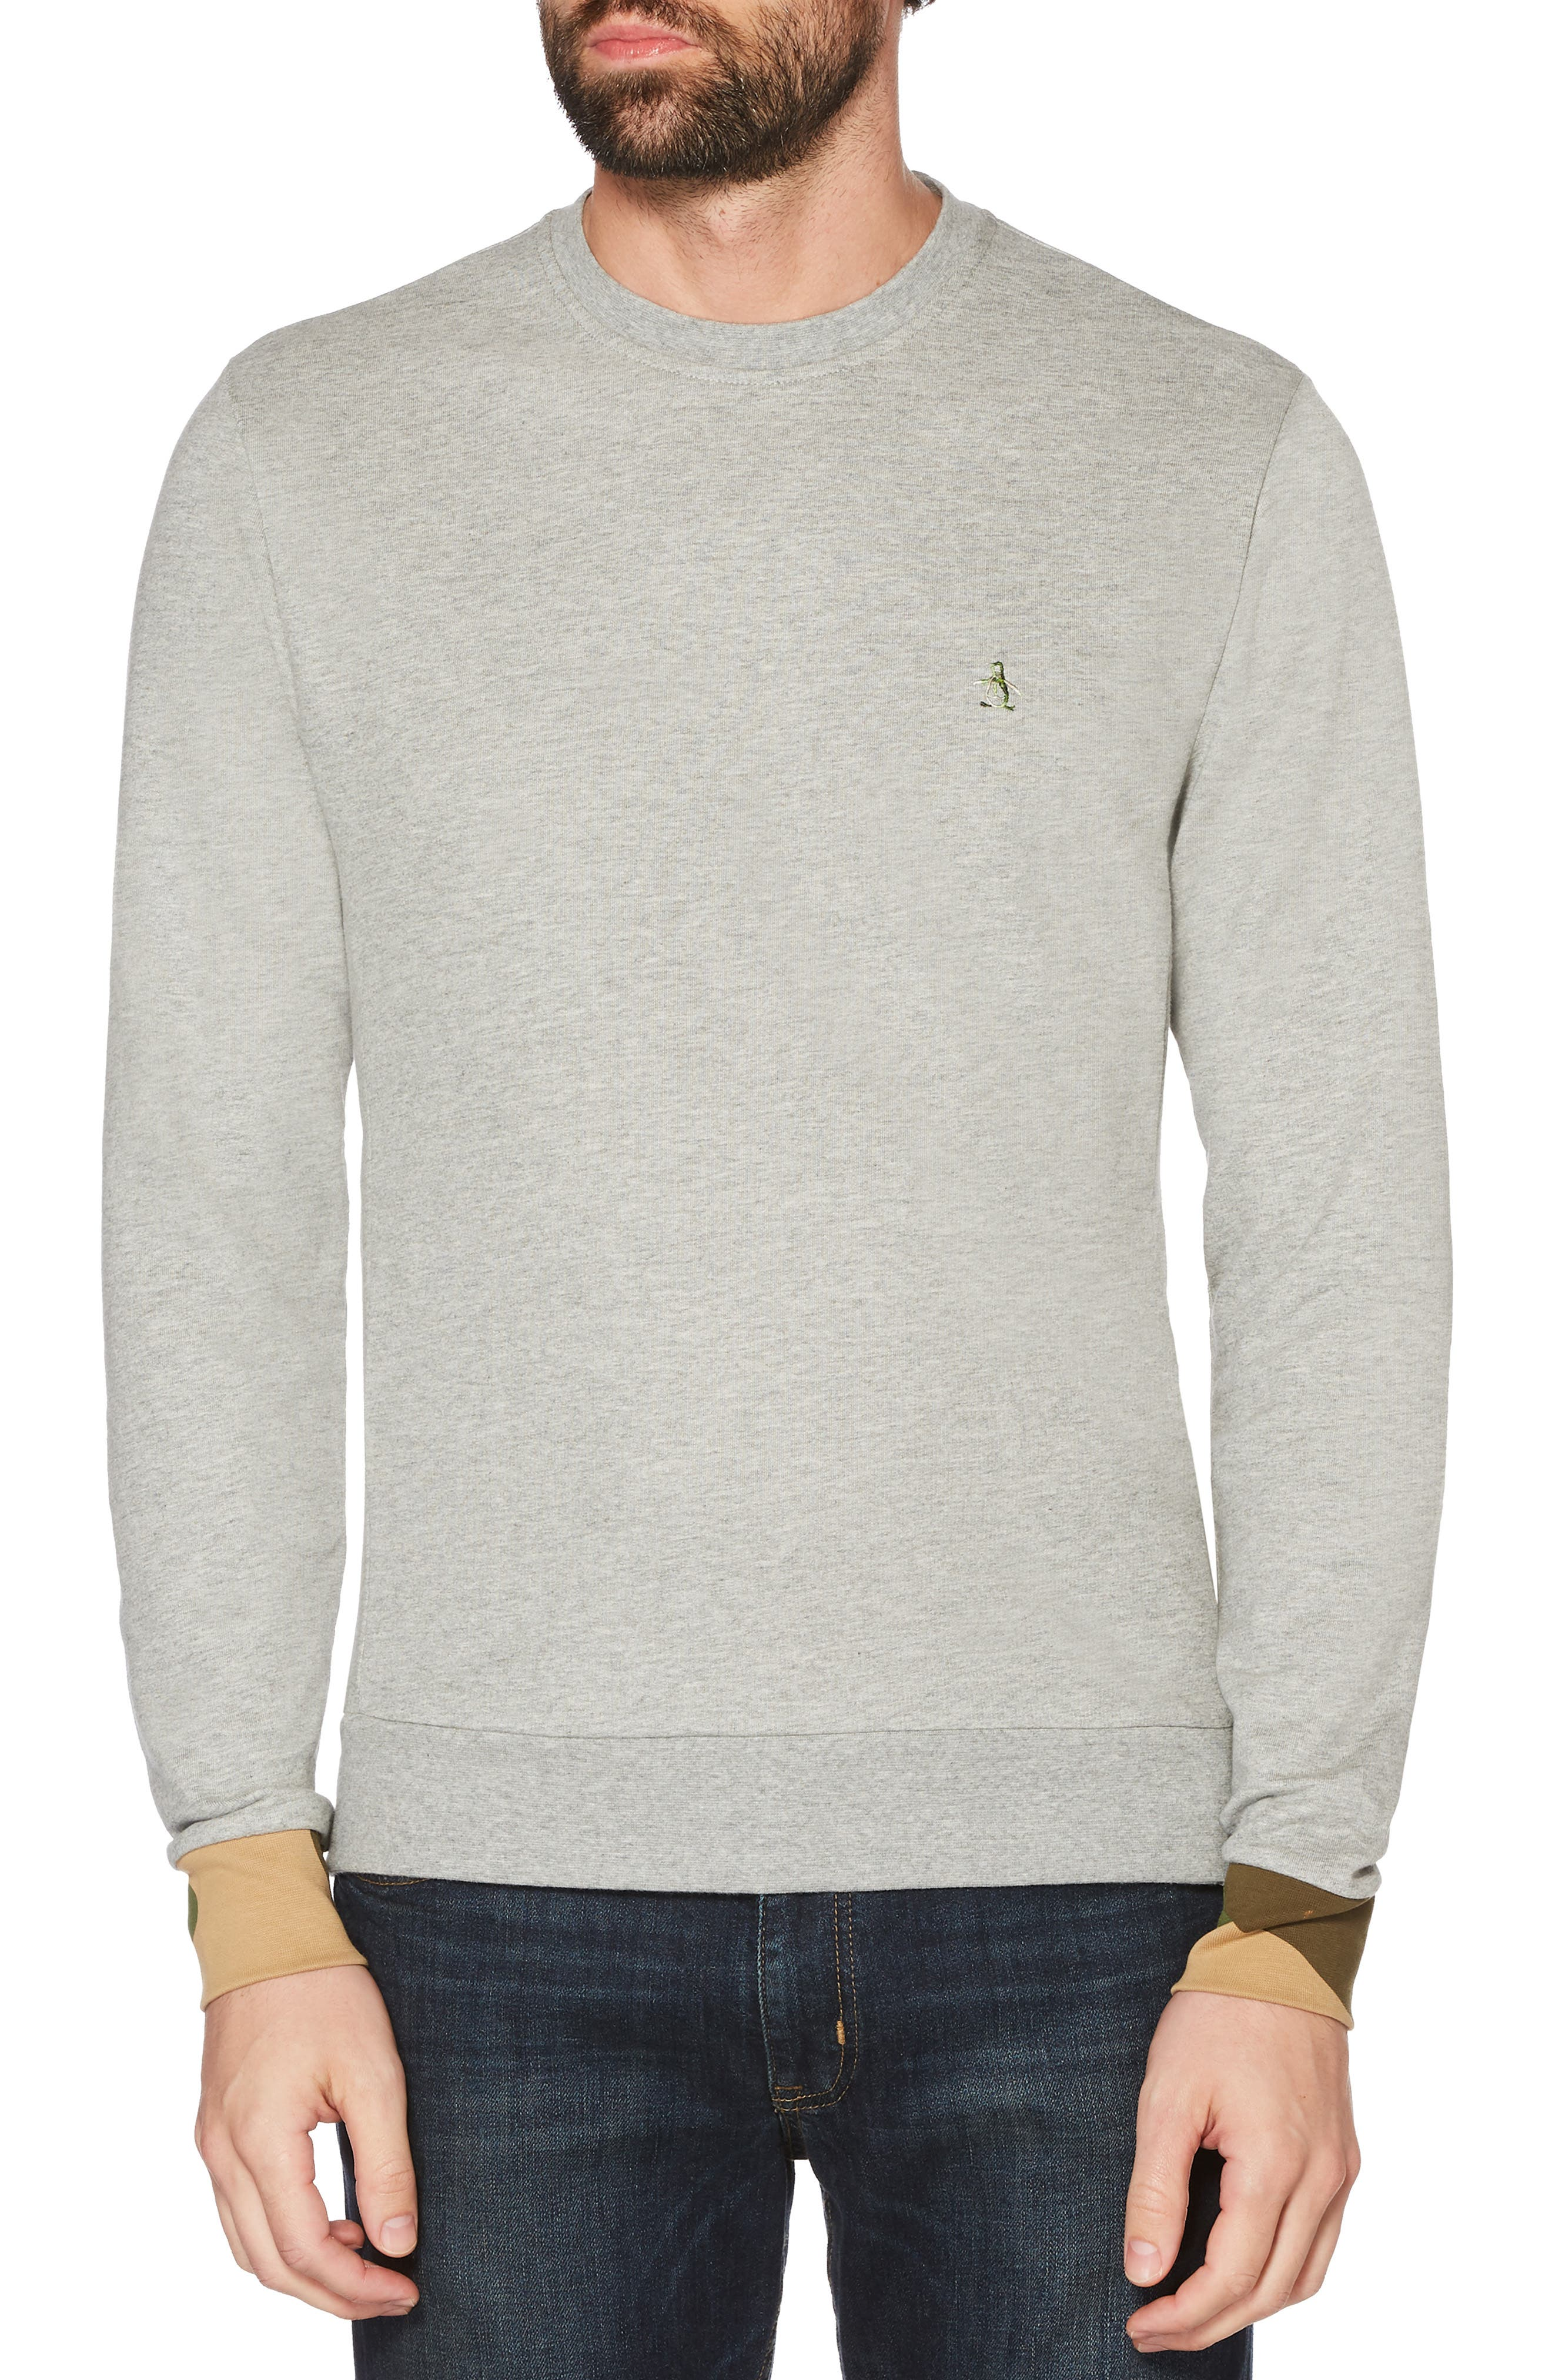 Camo Cuff Sweatshirt,                             Main thumbnail 1, color,                             080